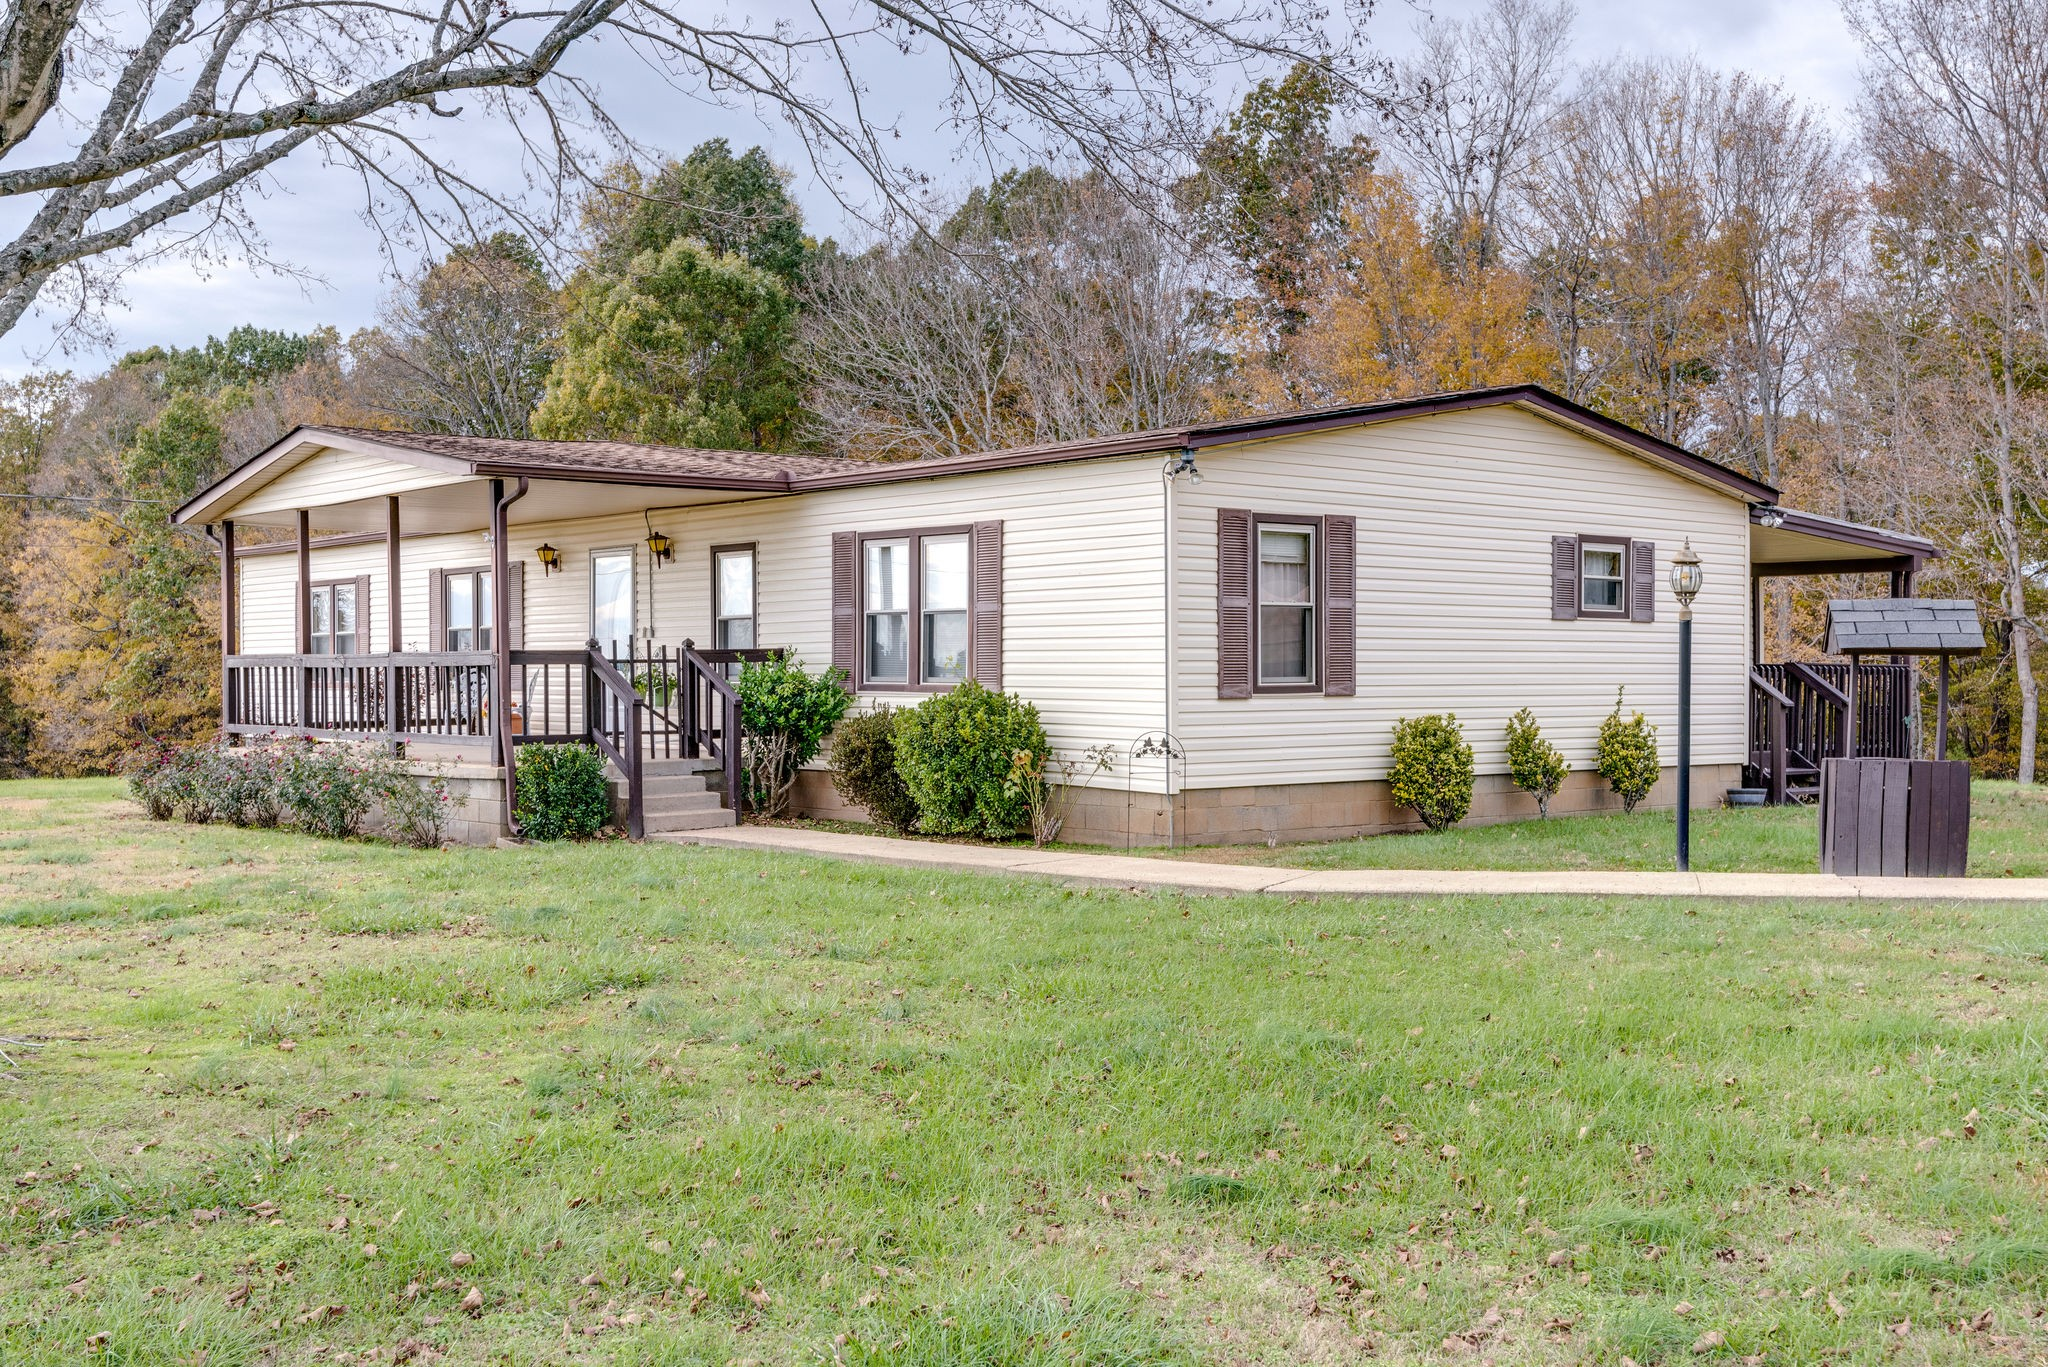 7785 Lampley Rd, Primm Springs, TN 38476 - Primm Springs, TN real estate listing